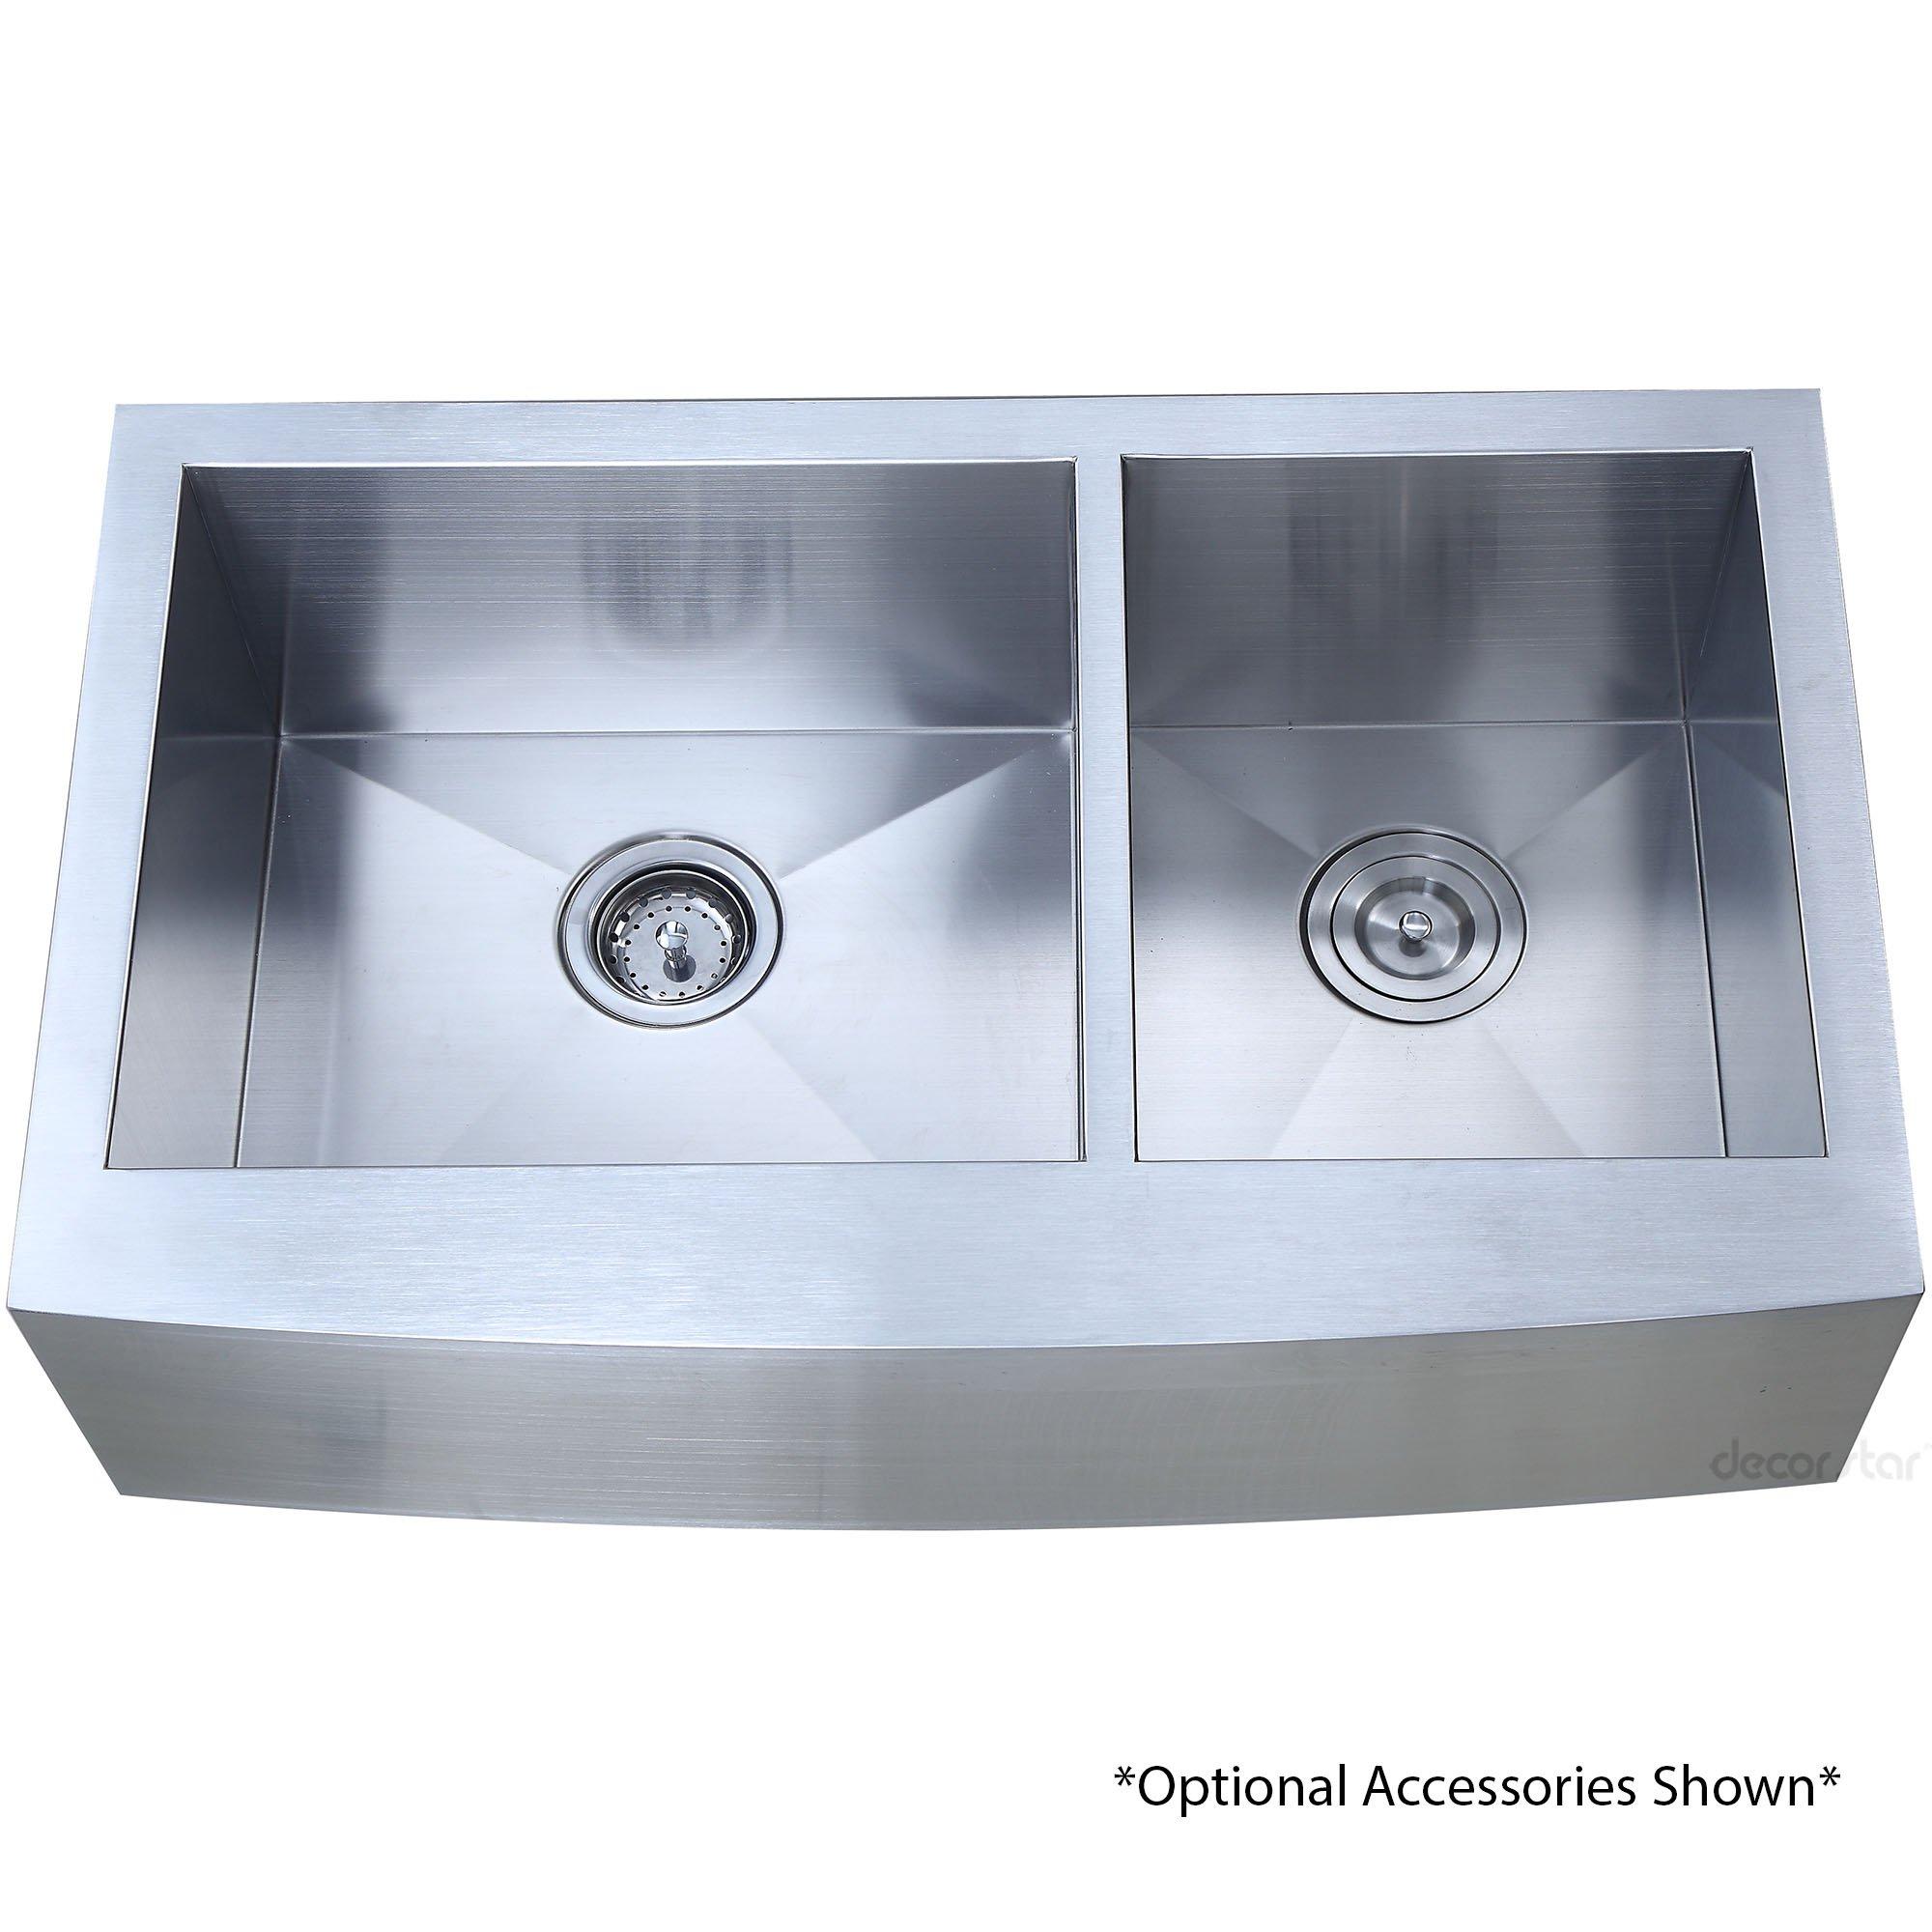 Decor Star F-002-Z 33 Inch x 20 Inch Farmhouse Apron 60/40 Offset Double Bowl 16 Gauge Stainless Steel Luxury Handmade Kitchen Sink cUPC Zero Radius by Décor Star (Image #6)